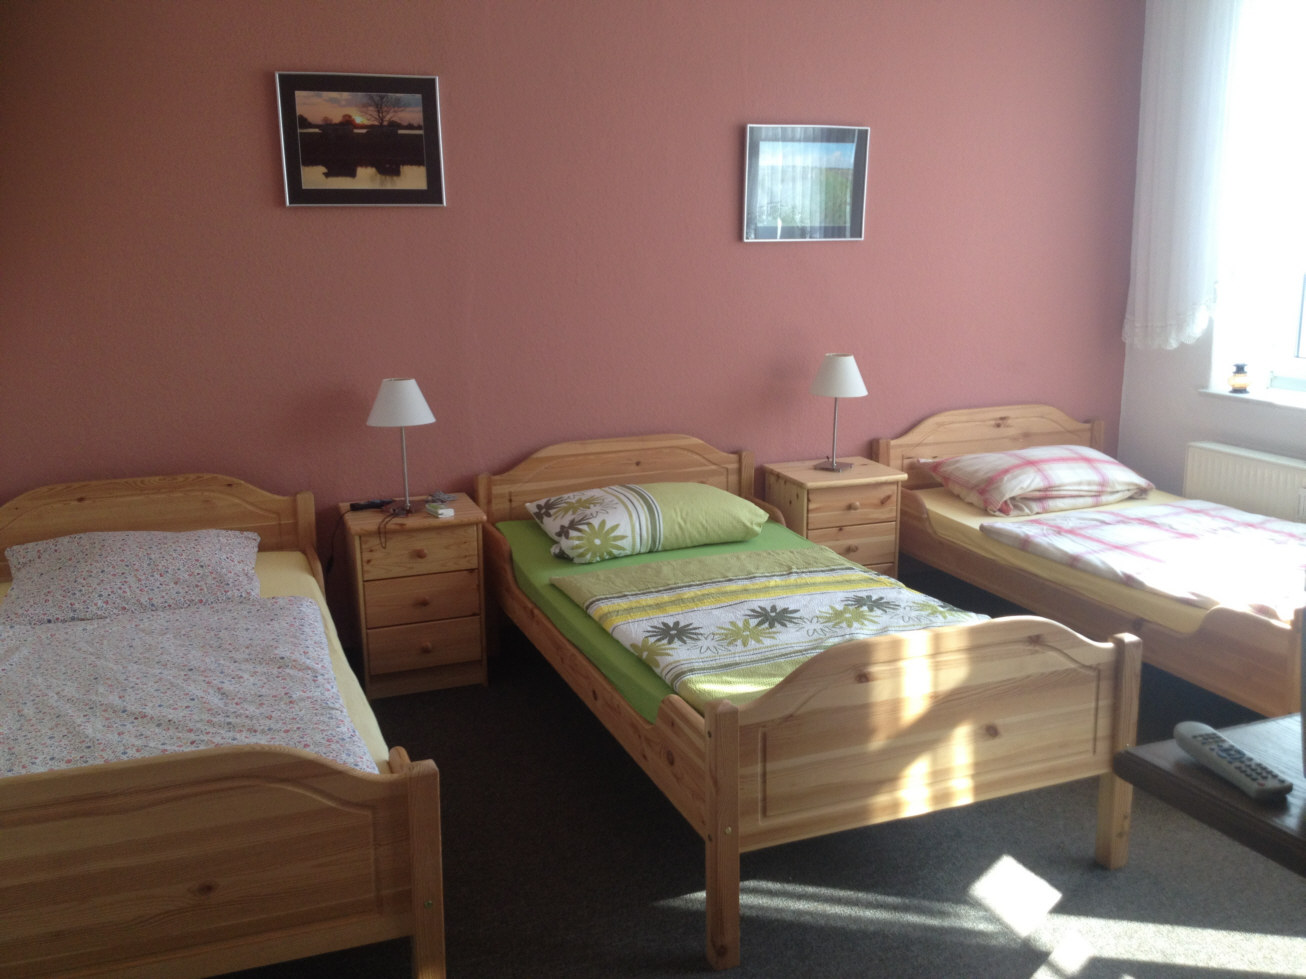 g nstige monteurzimmer ferchland unterkunft. Black Bedroom Furniture Sets. Home Design Ideas